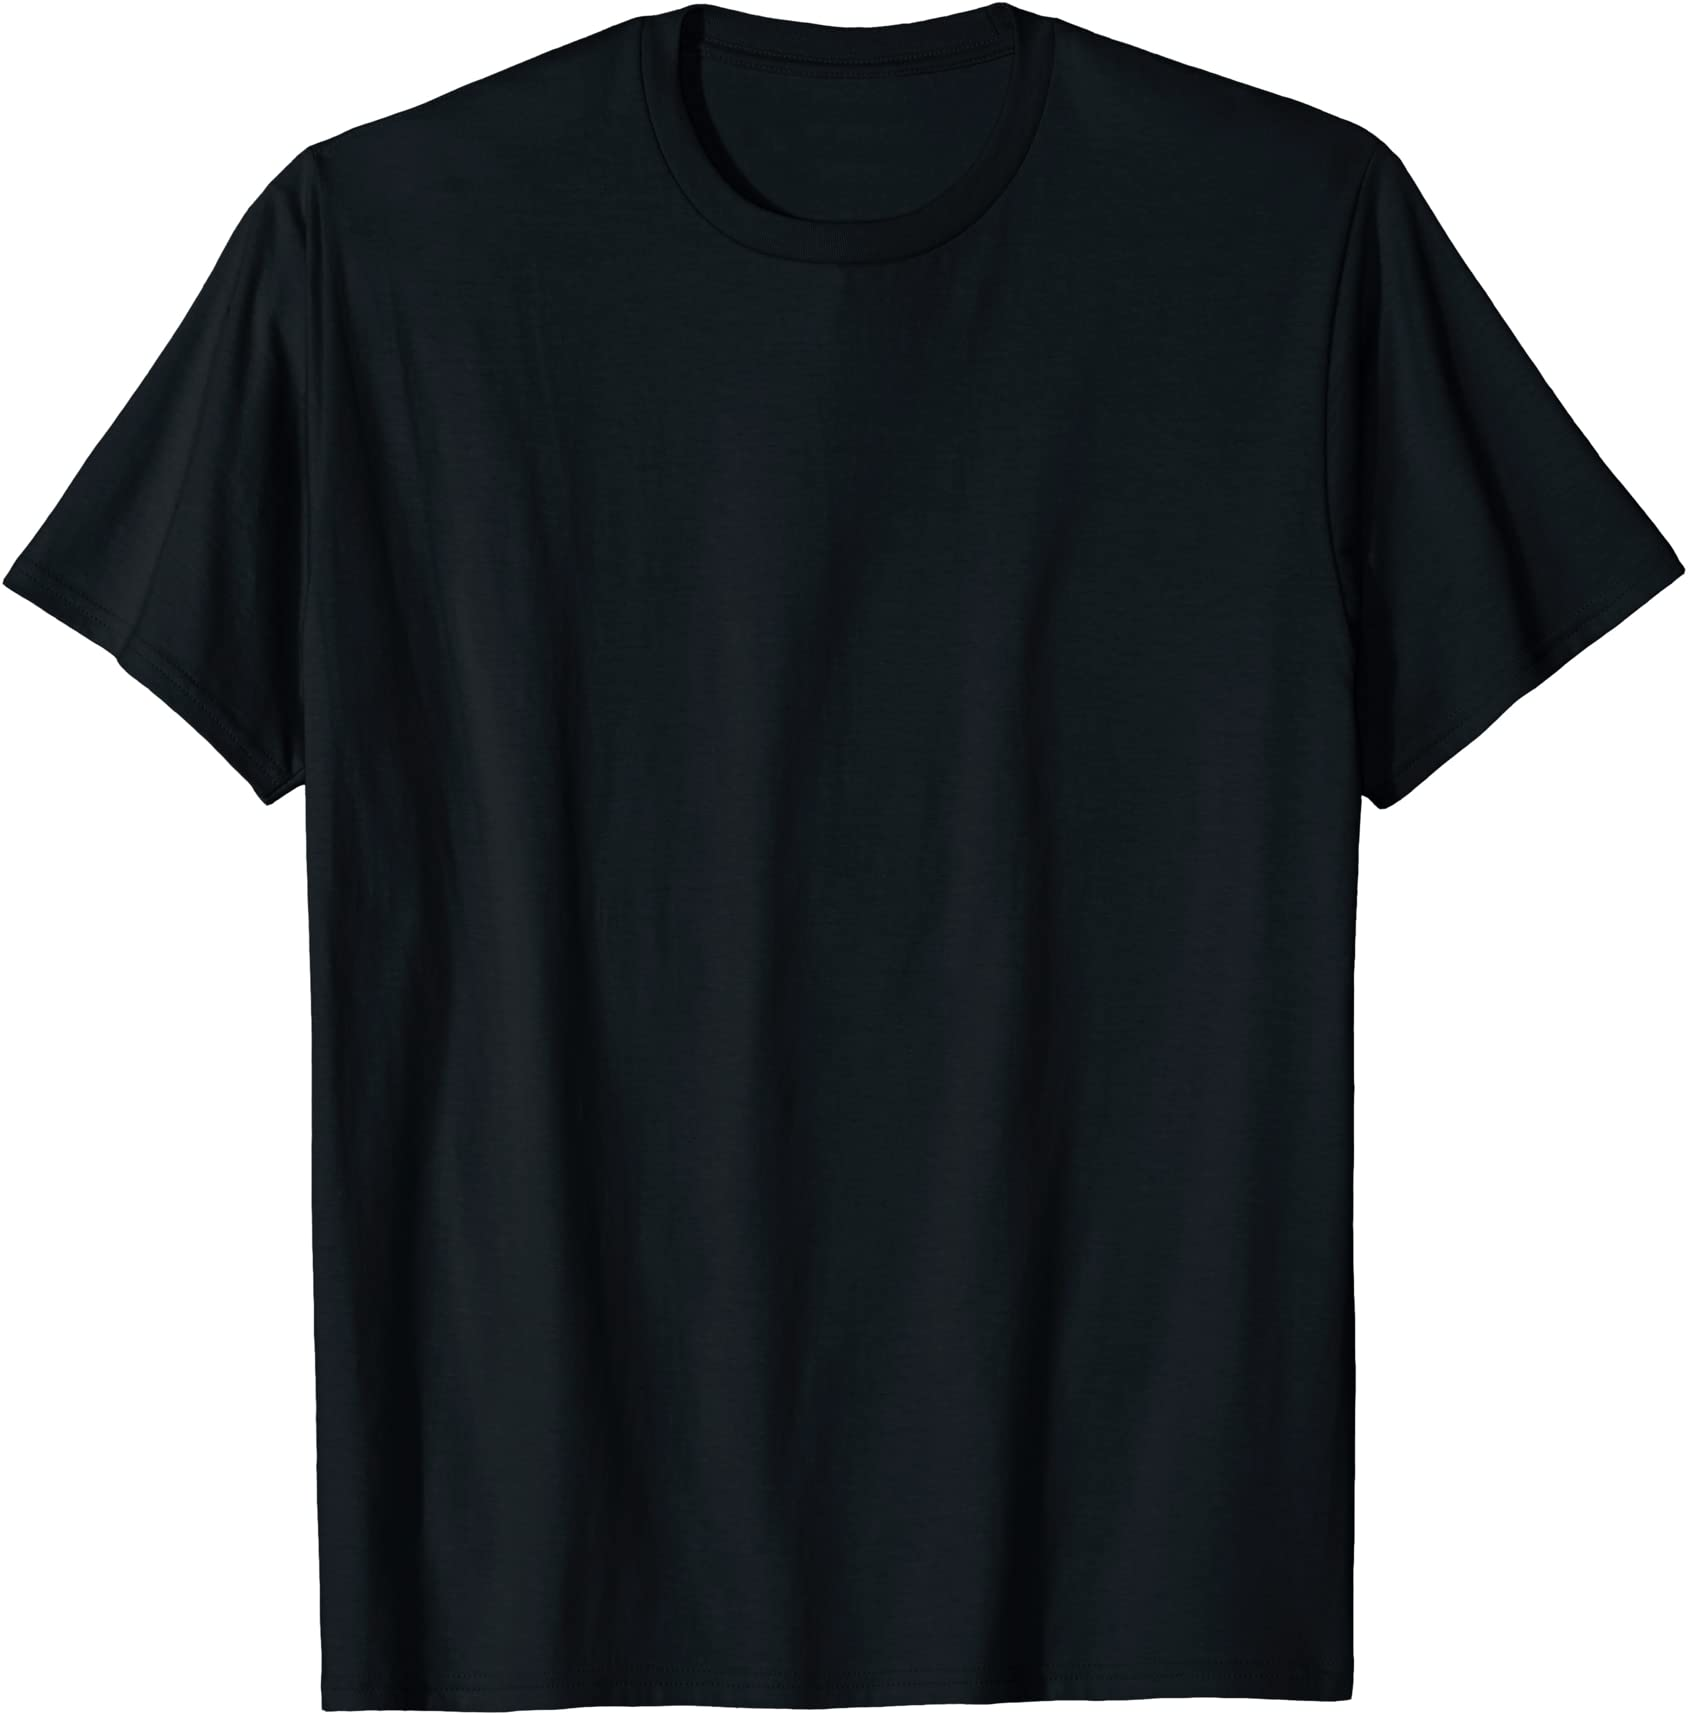 Paddidas Mens T-Shirt Funny Saint Patrick/'s Day Ireland Clover Leaf